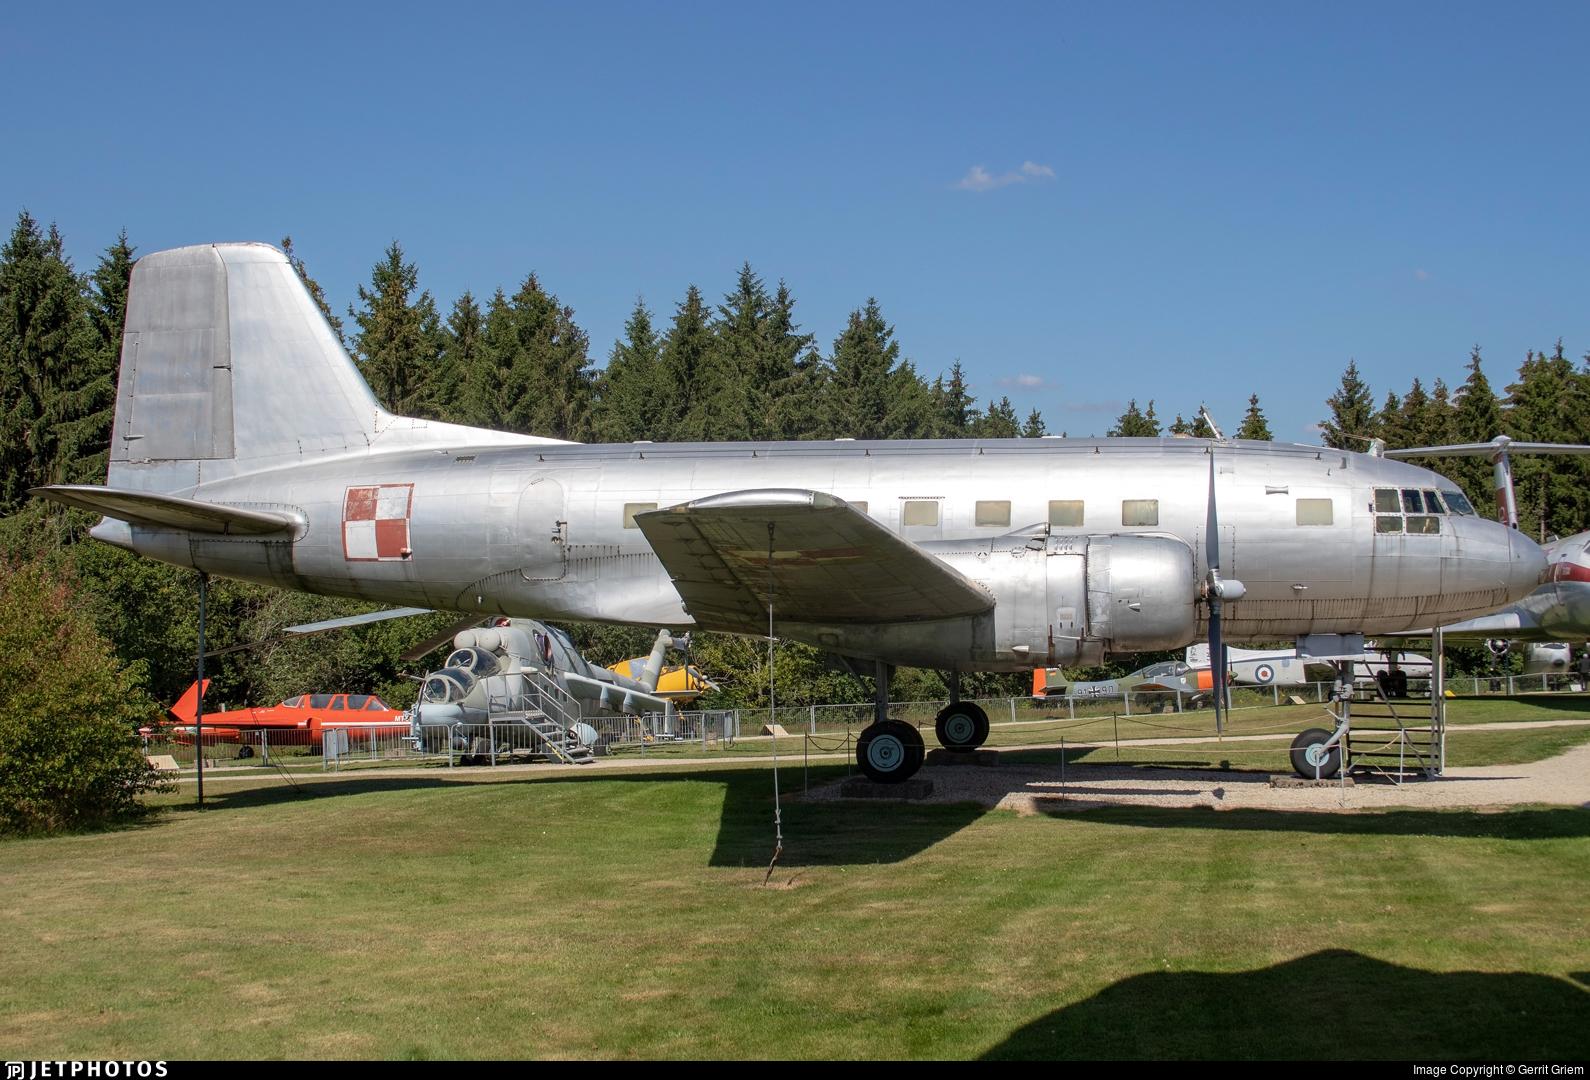 3076 - VEB Flugzeugbau IL-14P - Poland - Air Force